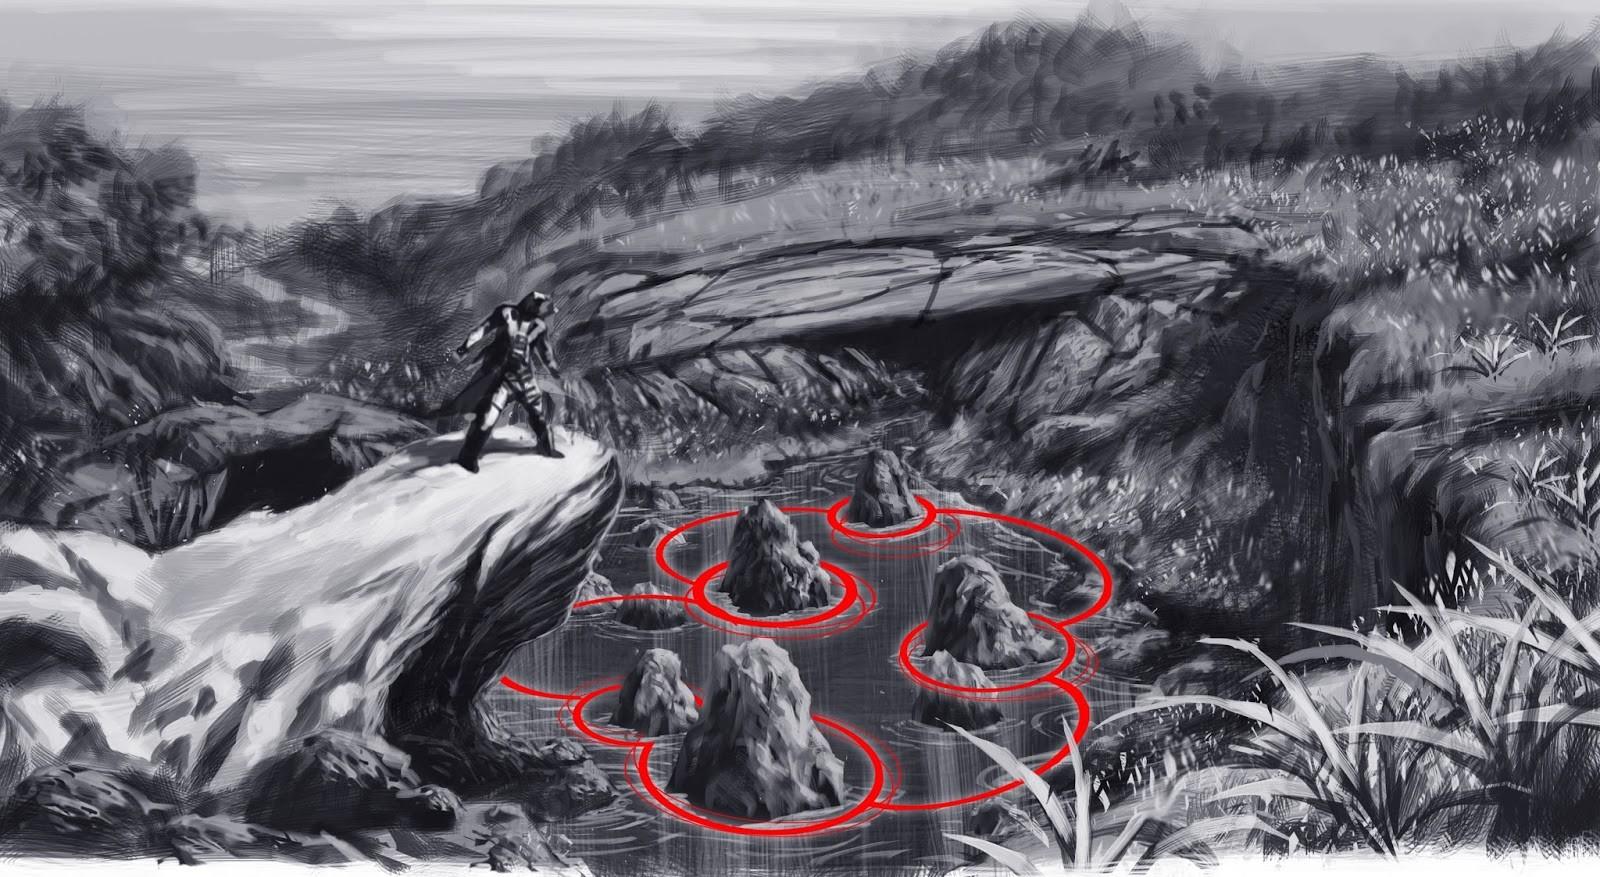 jing-cherng-wong-ac3-gp-oakisland-map03b-jing-cherng